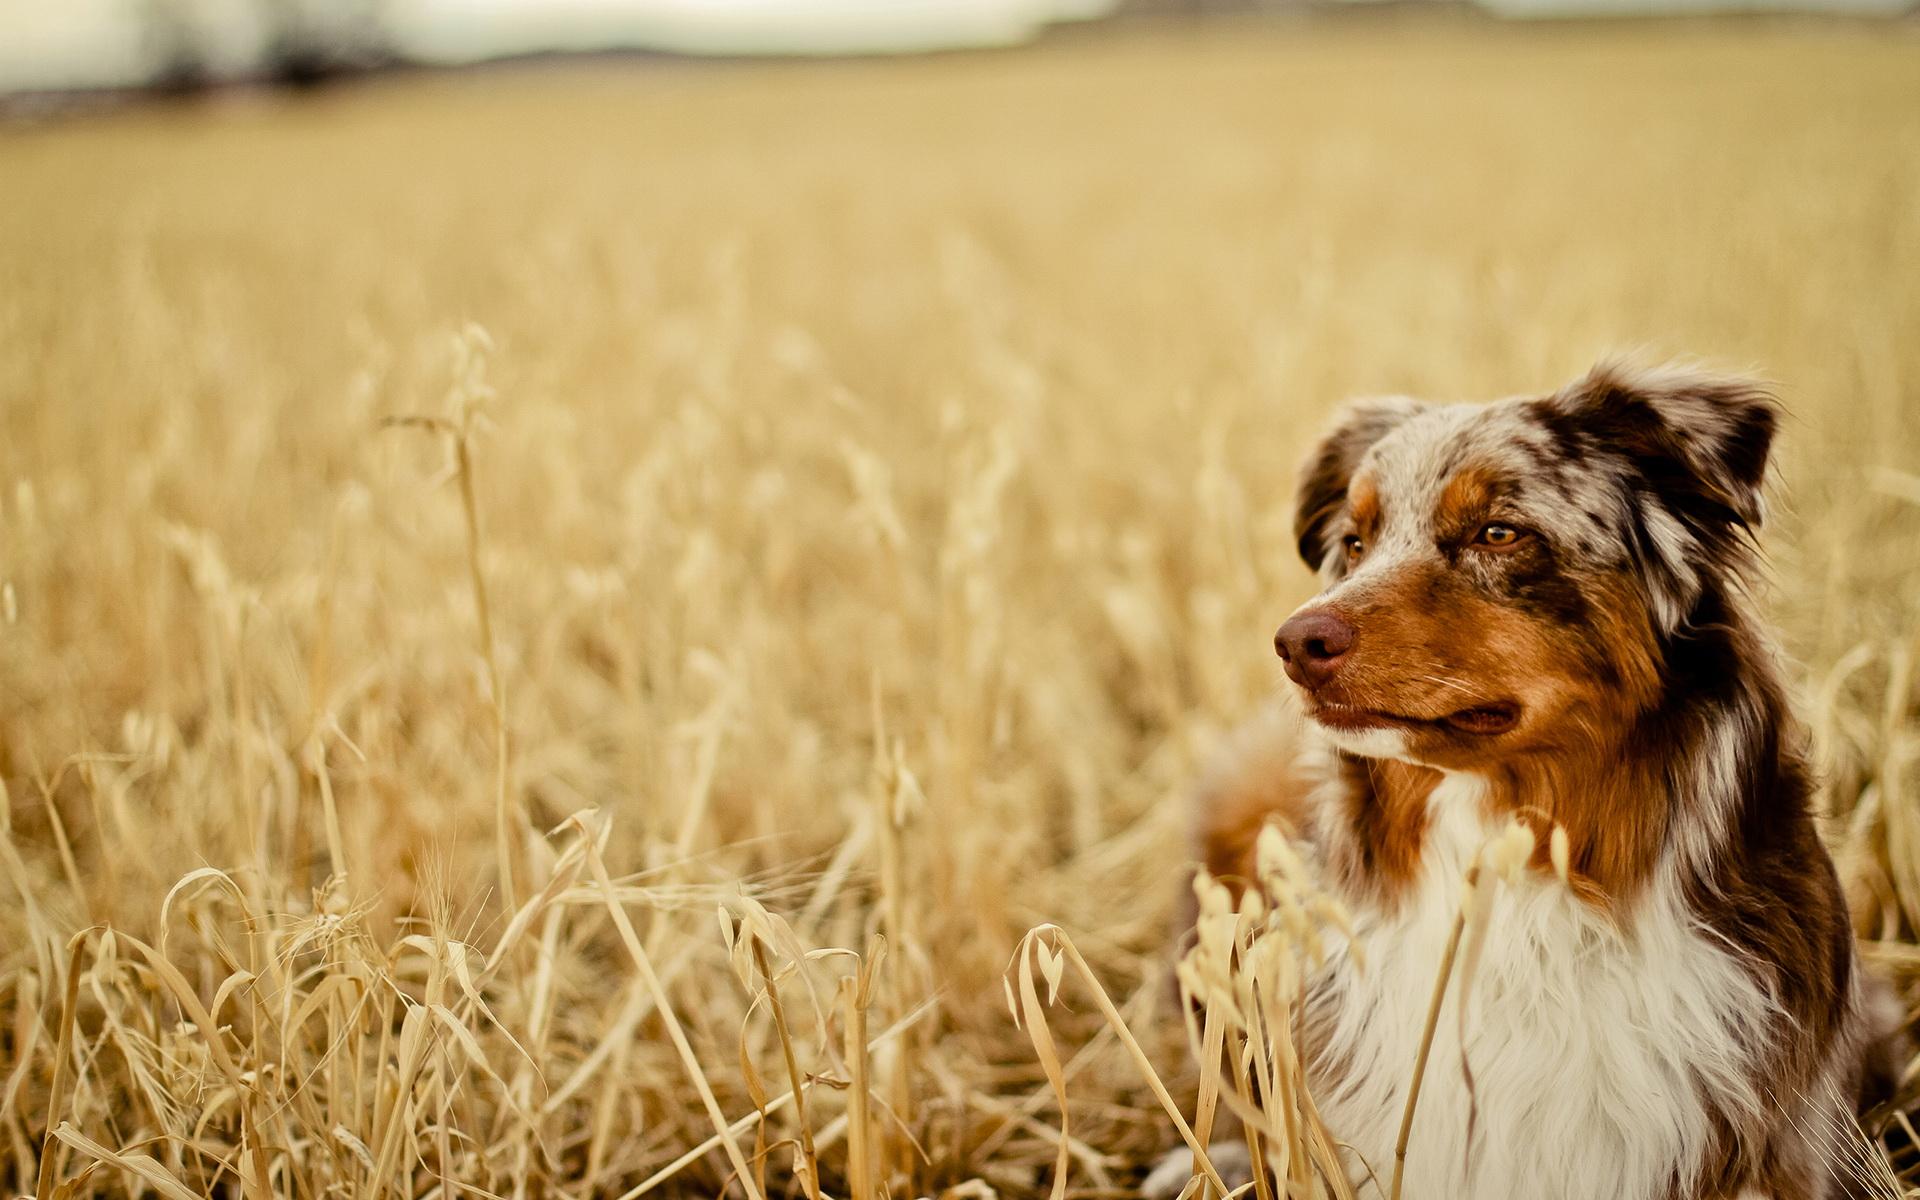 hondenoppas professionele hondenppas in huiselijke kring On hondenoppas